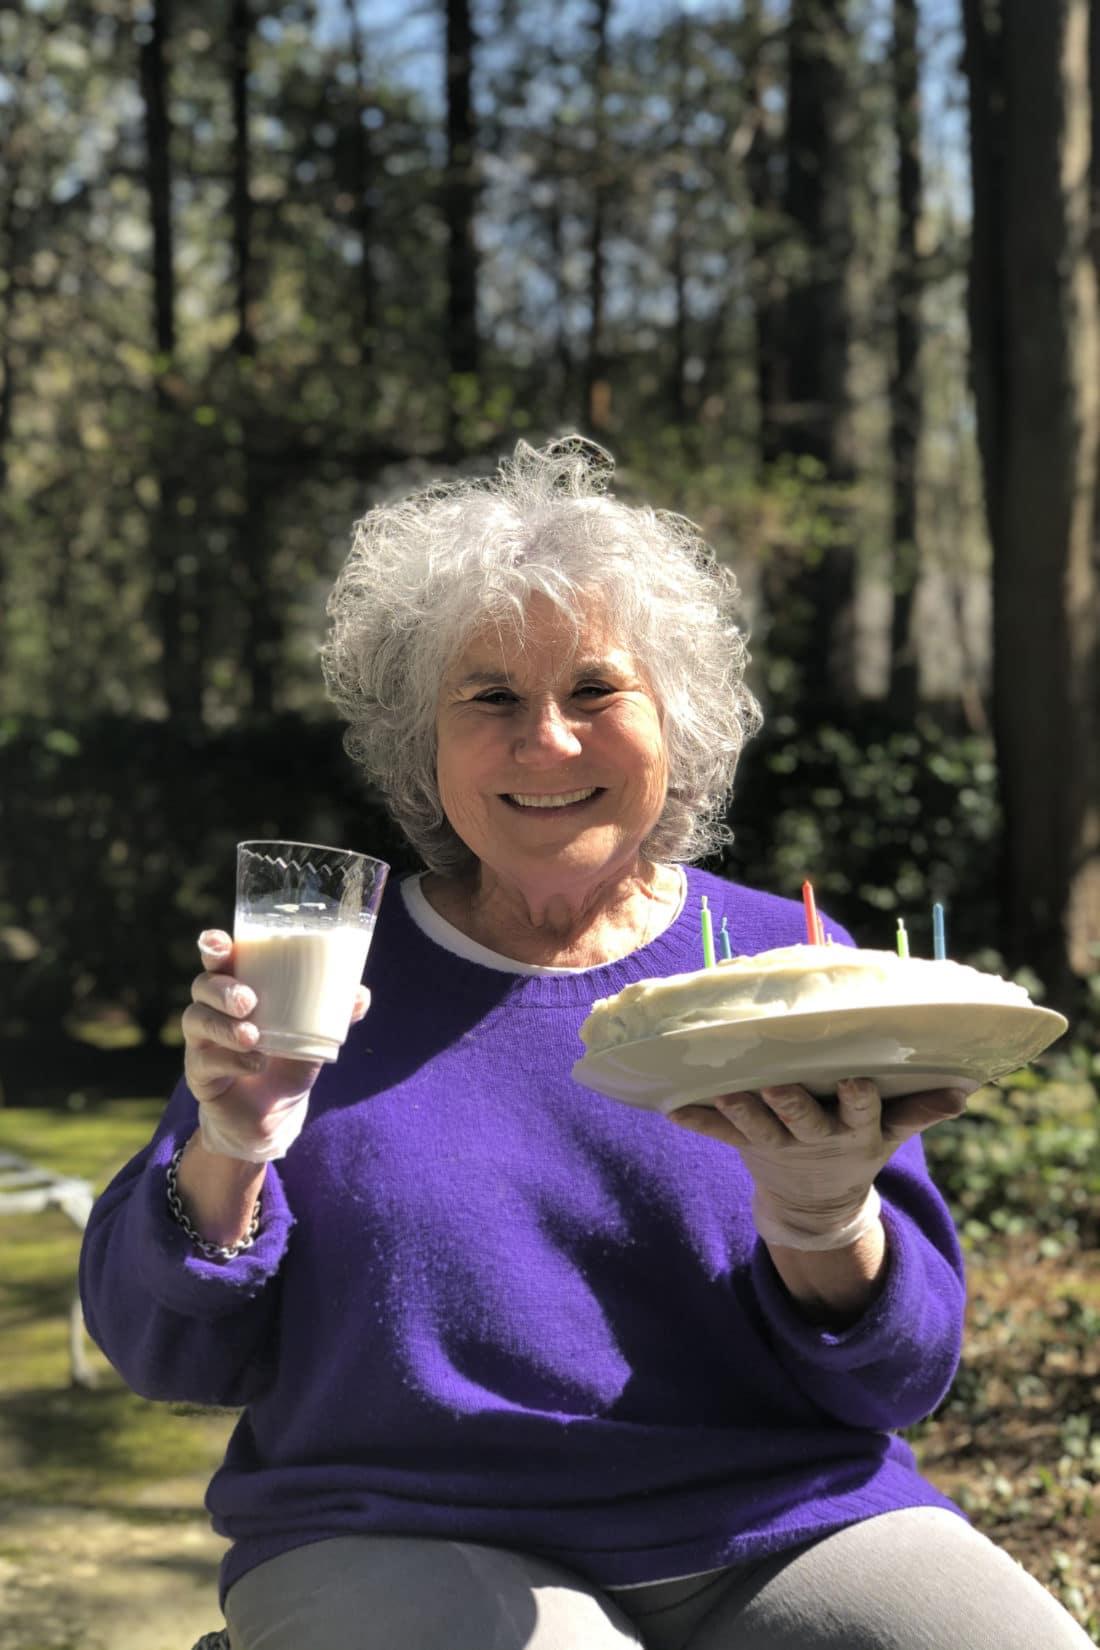 Mom holding up a slice of banana cake